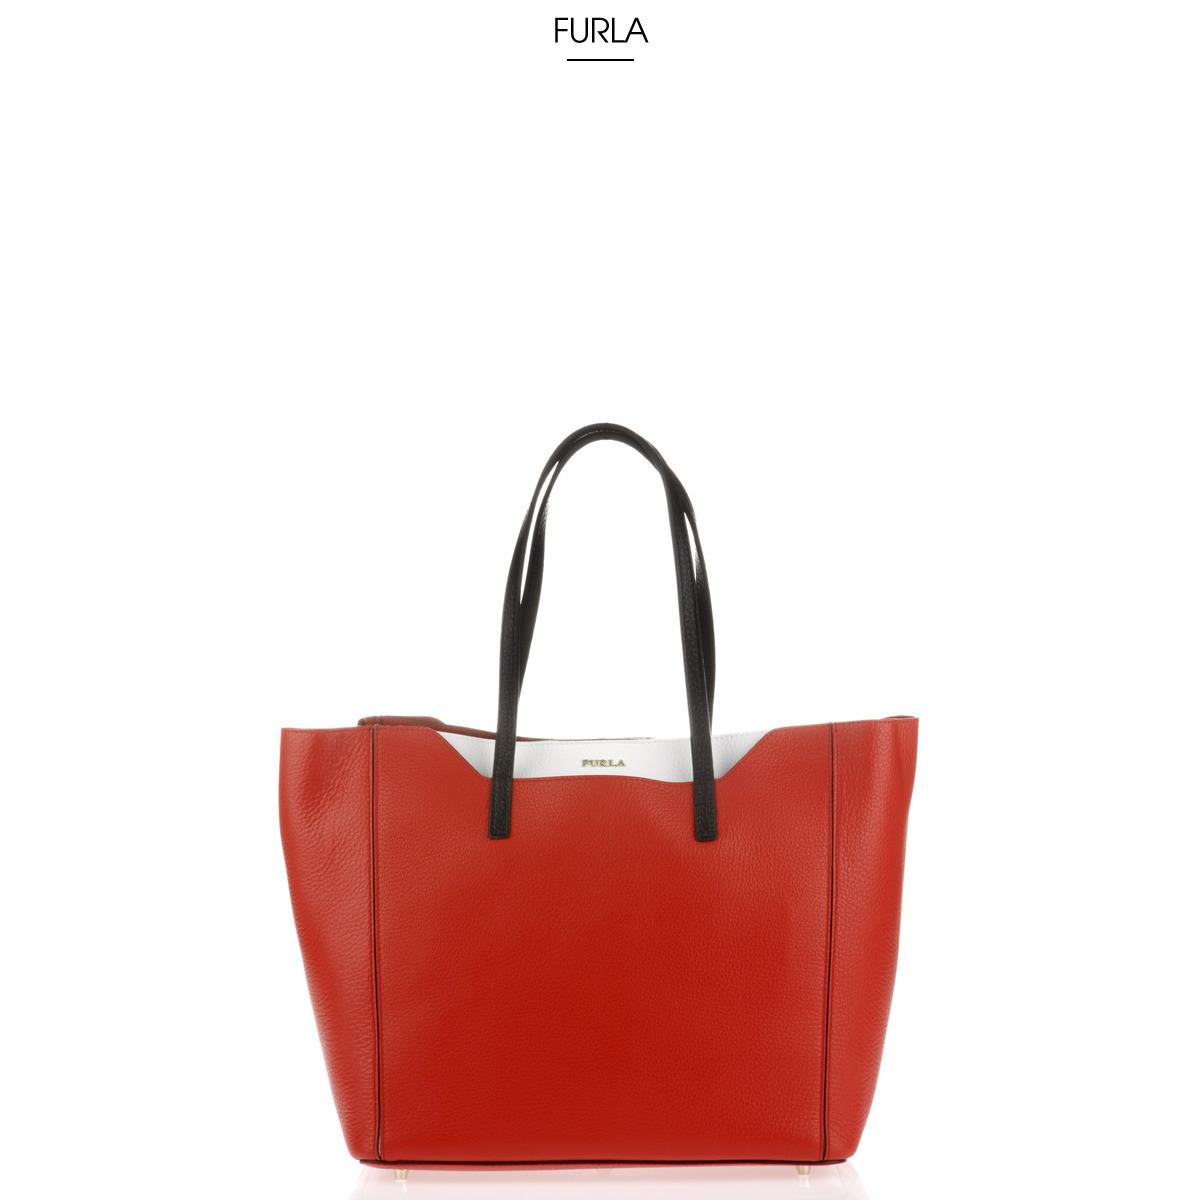 FURLA/芙拉 代购 女士新款时尚简约手提单肩包 811089